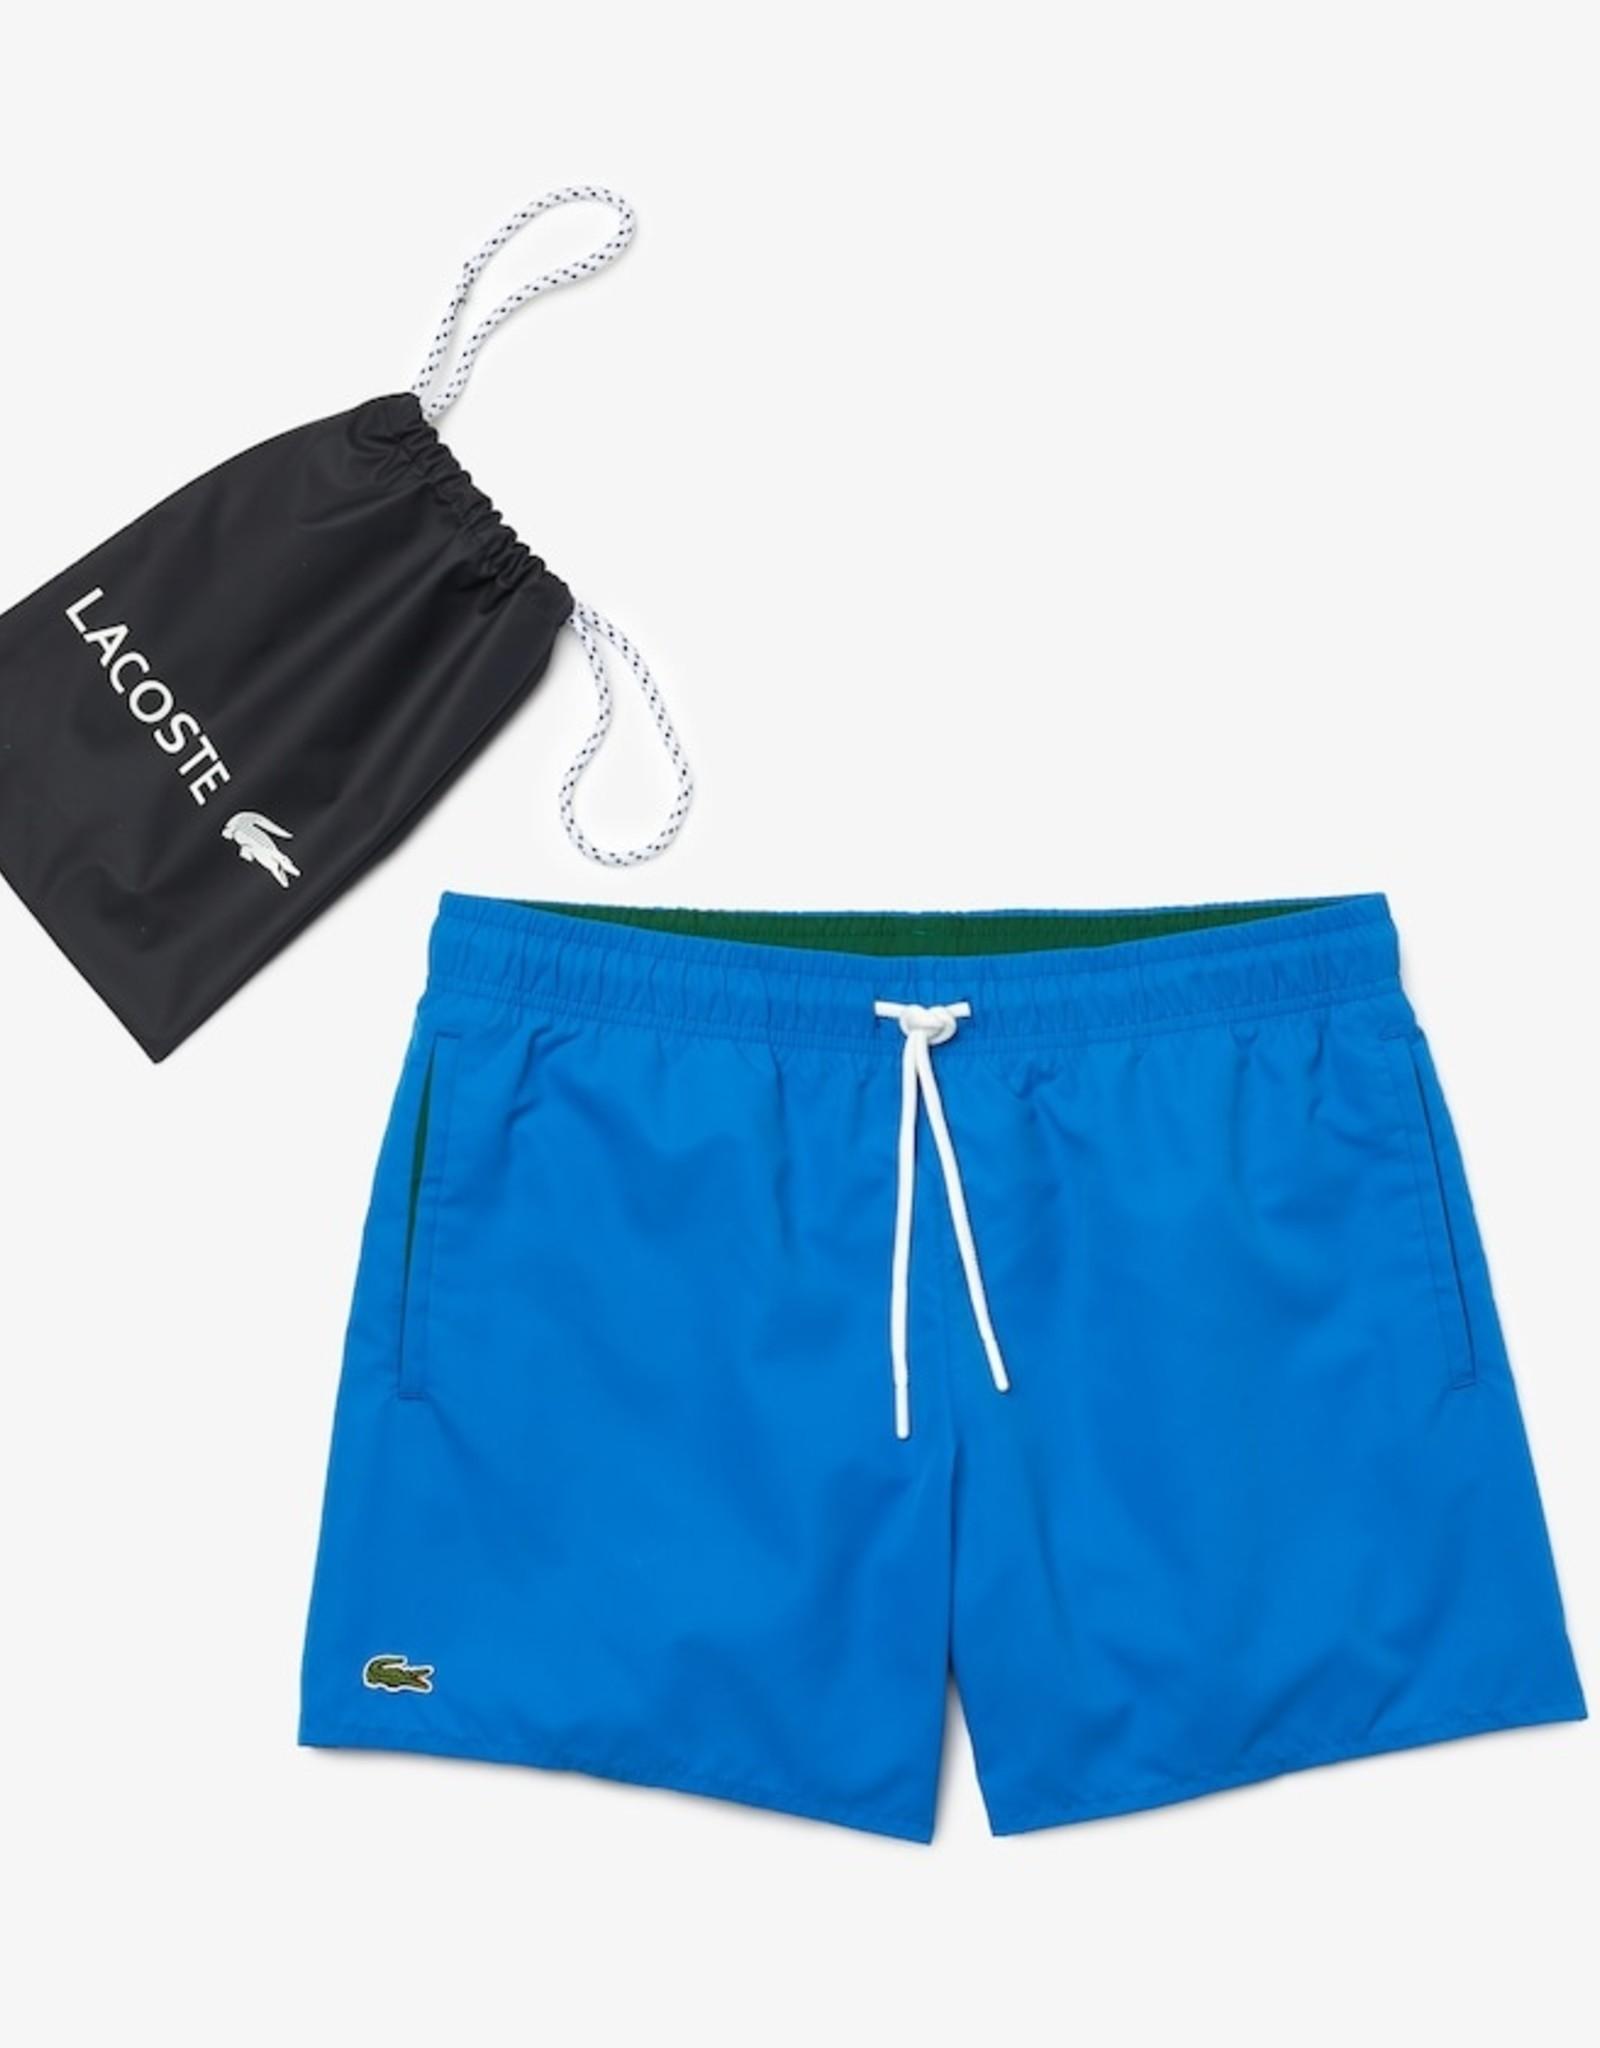 Lacoste Lacoste Light Quick-Dry Swim Shorts